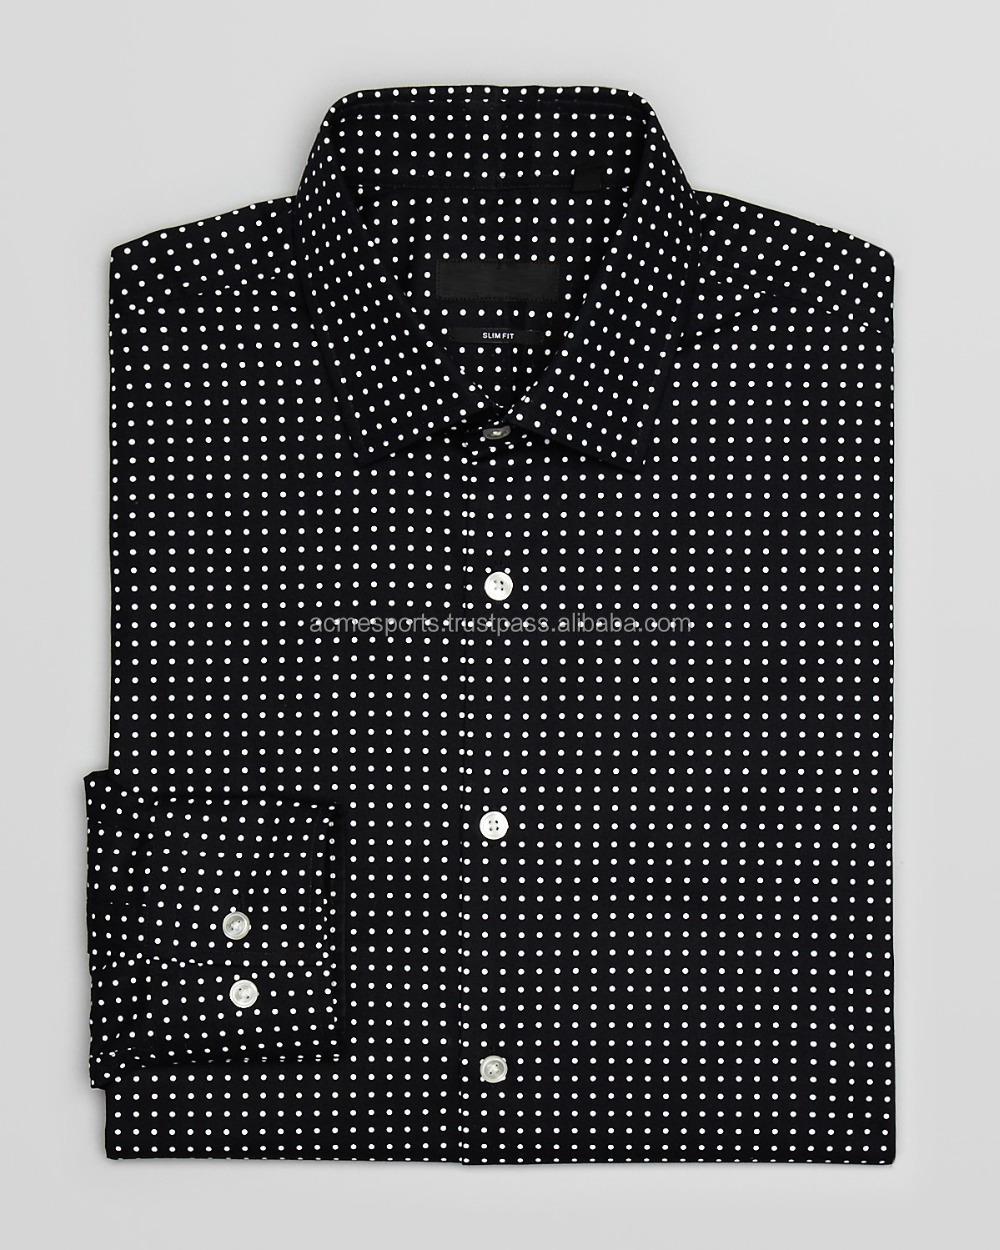 Slim Fit Dress Shirts Men 100 Cotton Tailor Made Custom Made